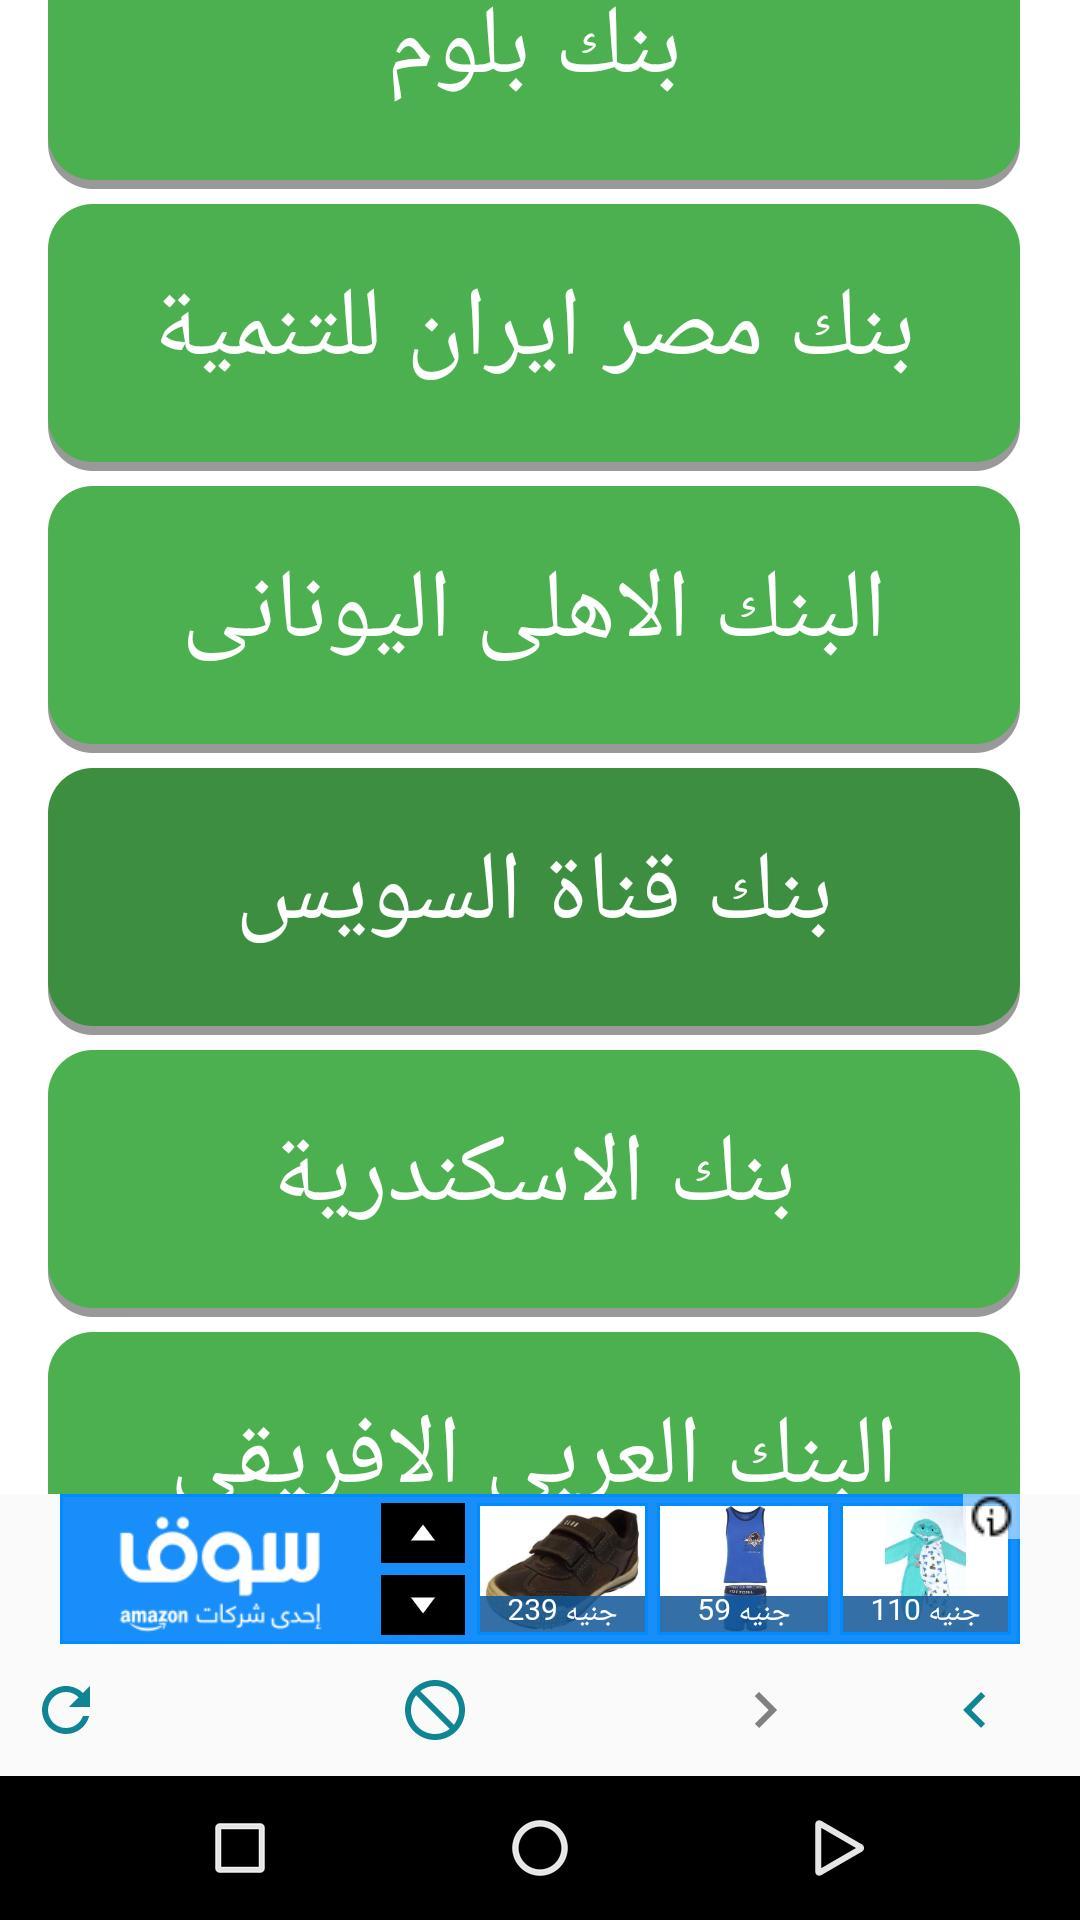 اسعار العملات فى مصر بالبنوك For Android Apk Download